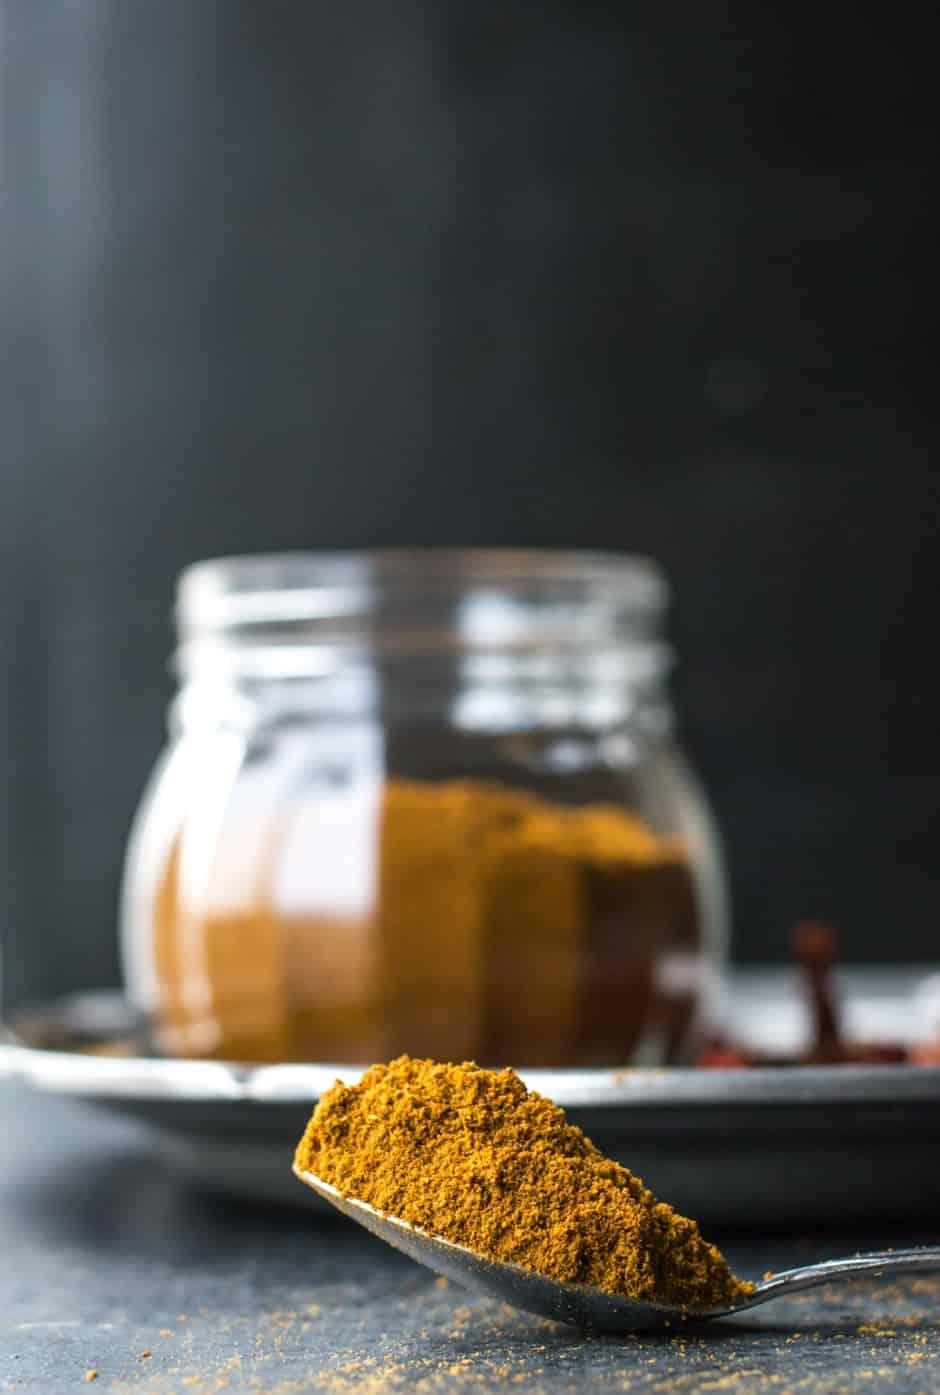 A spoon full of sambar powder